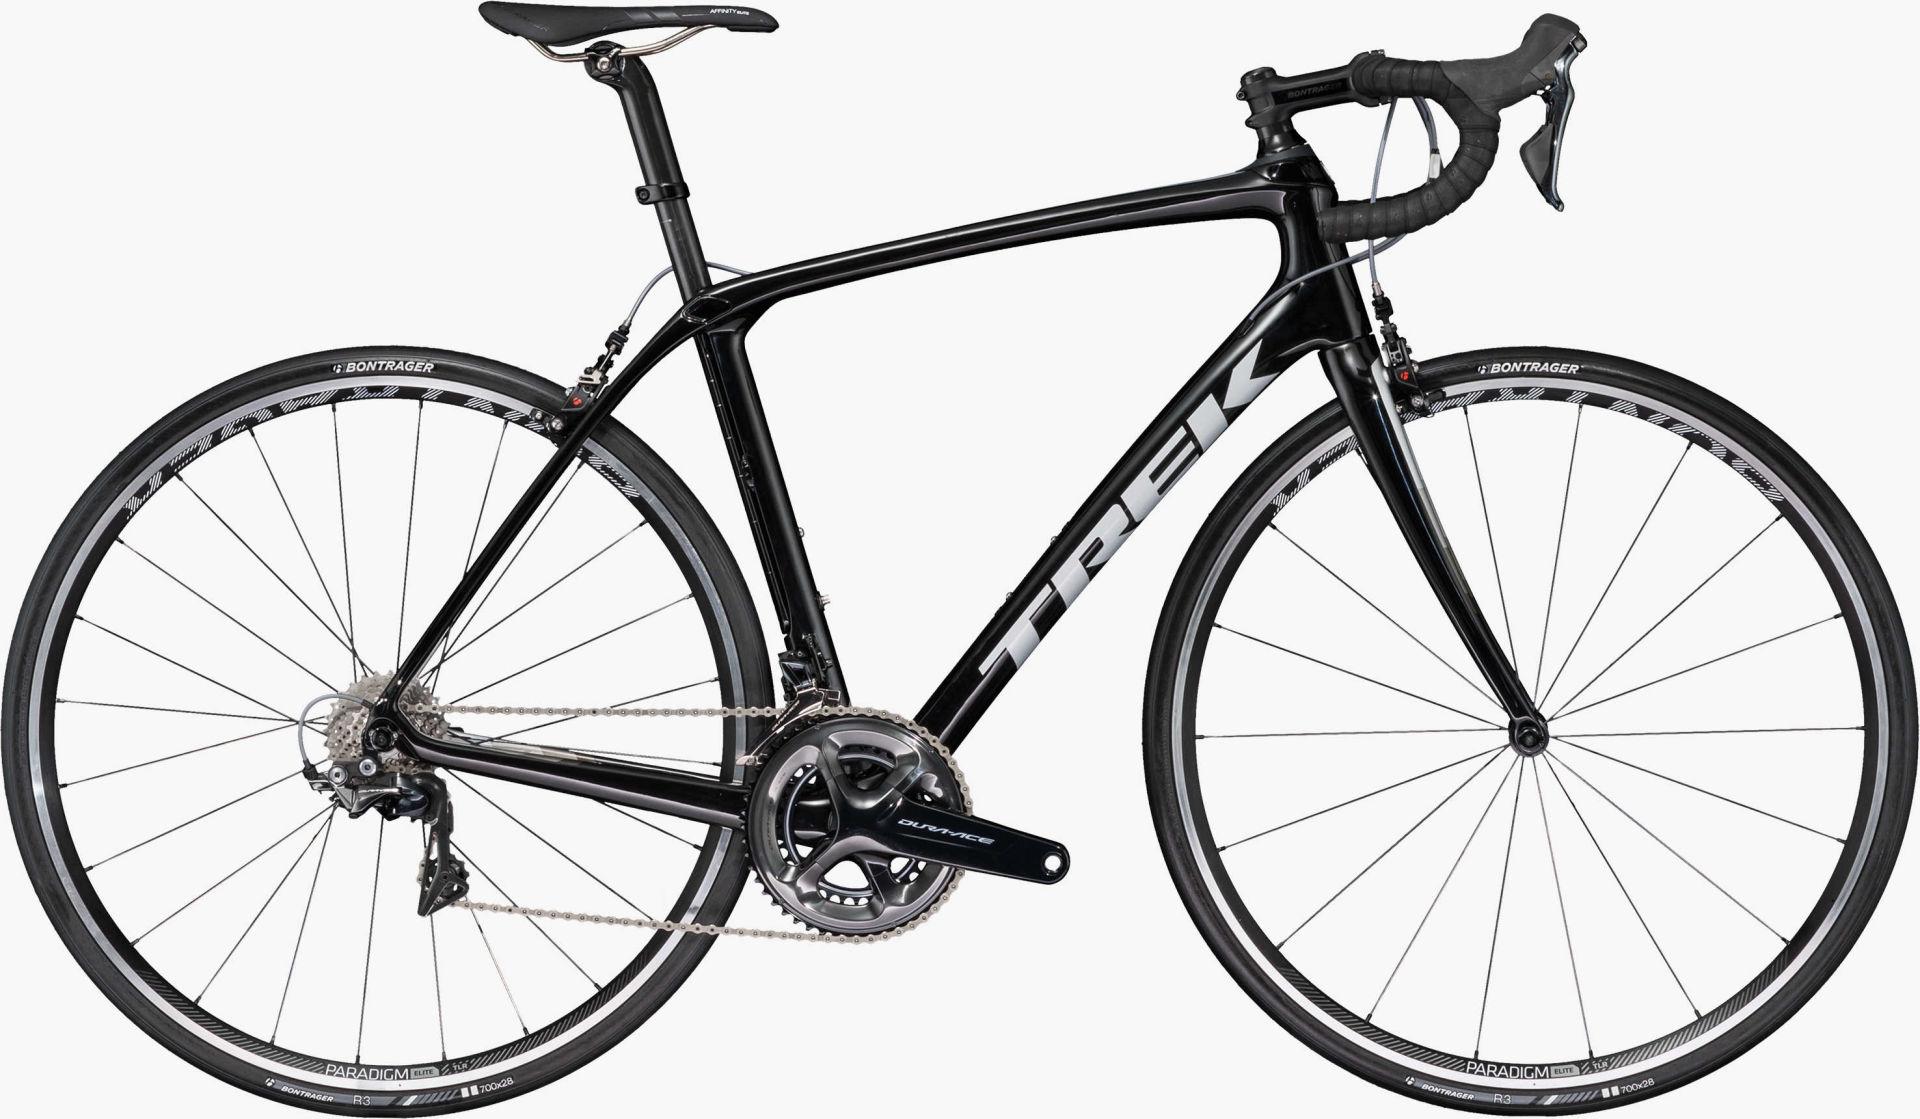 Trek Domane Slr 8 2017 Racing Bike